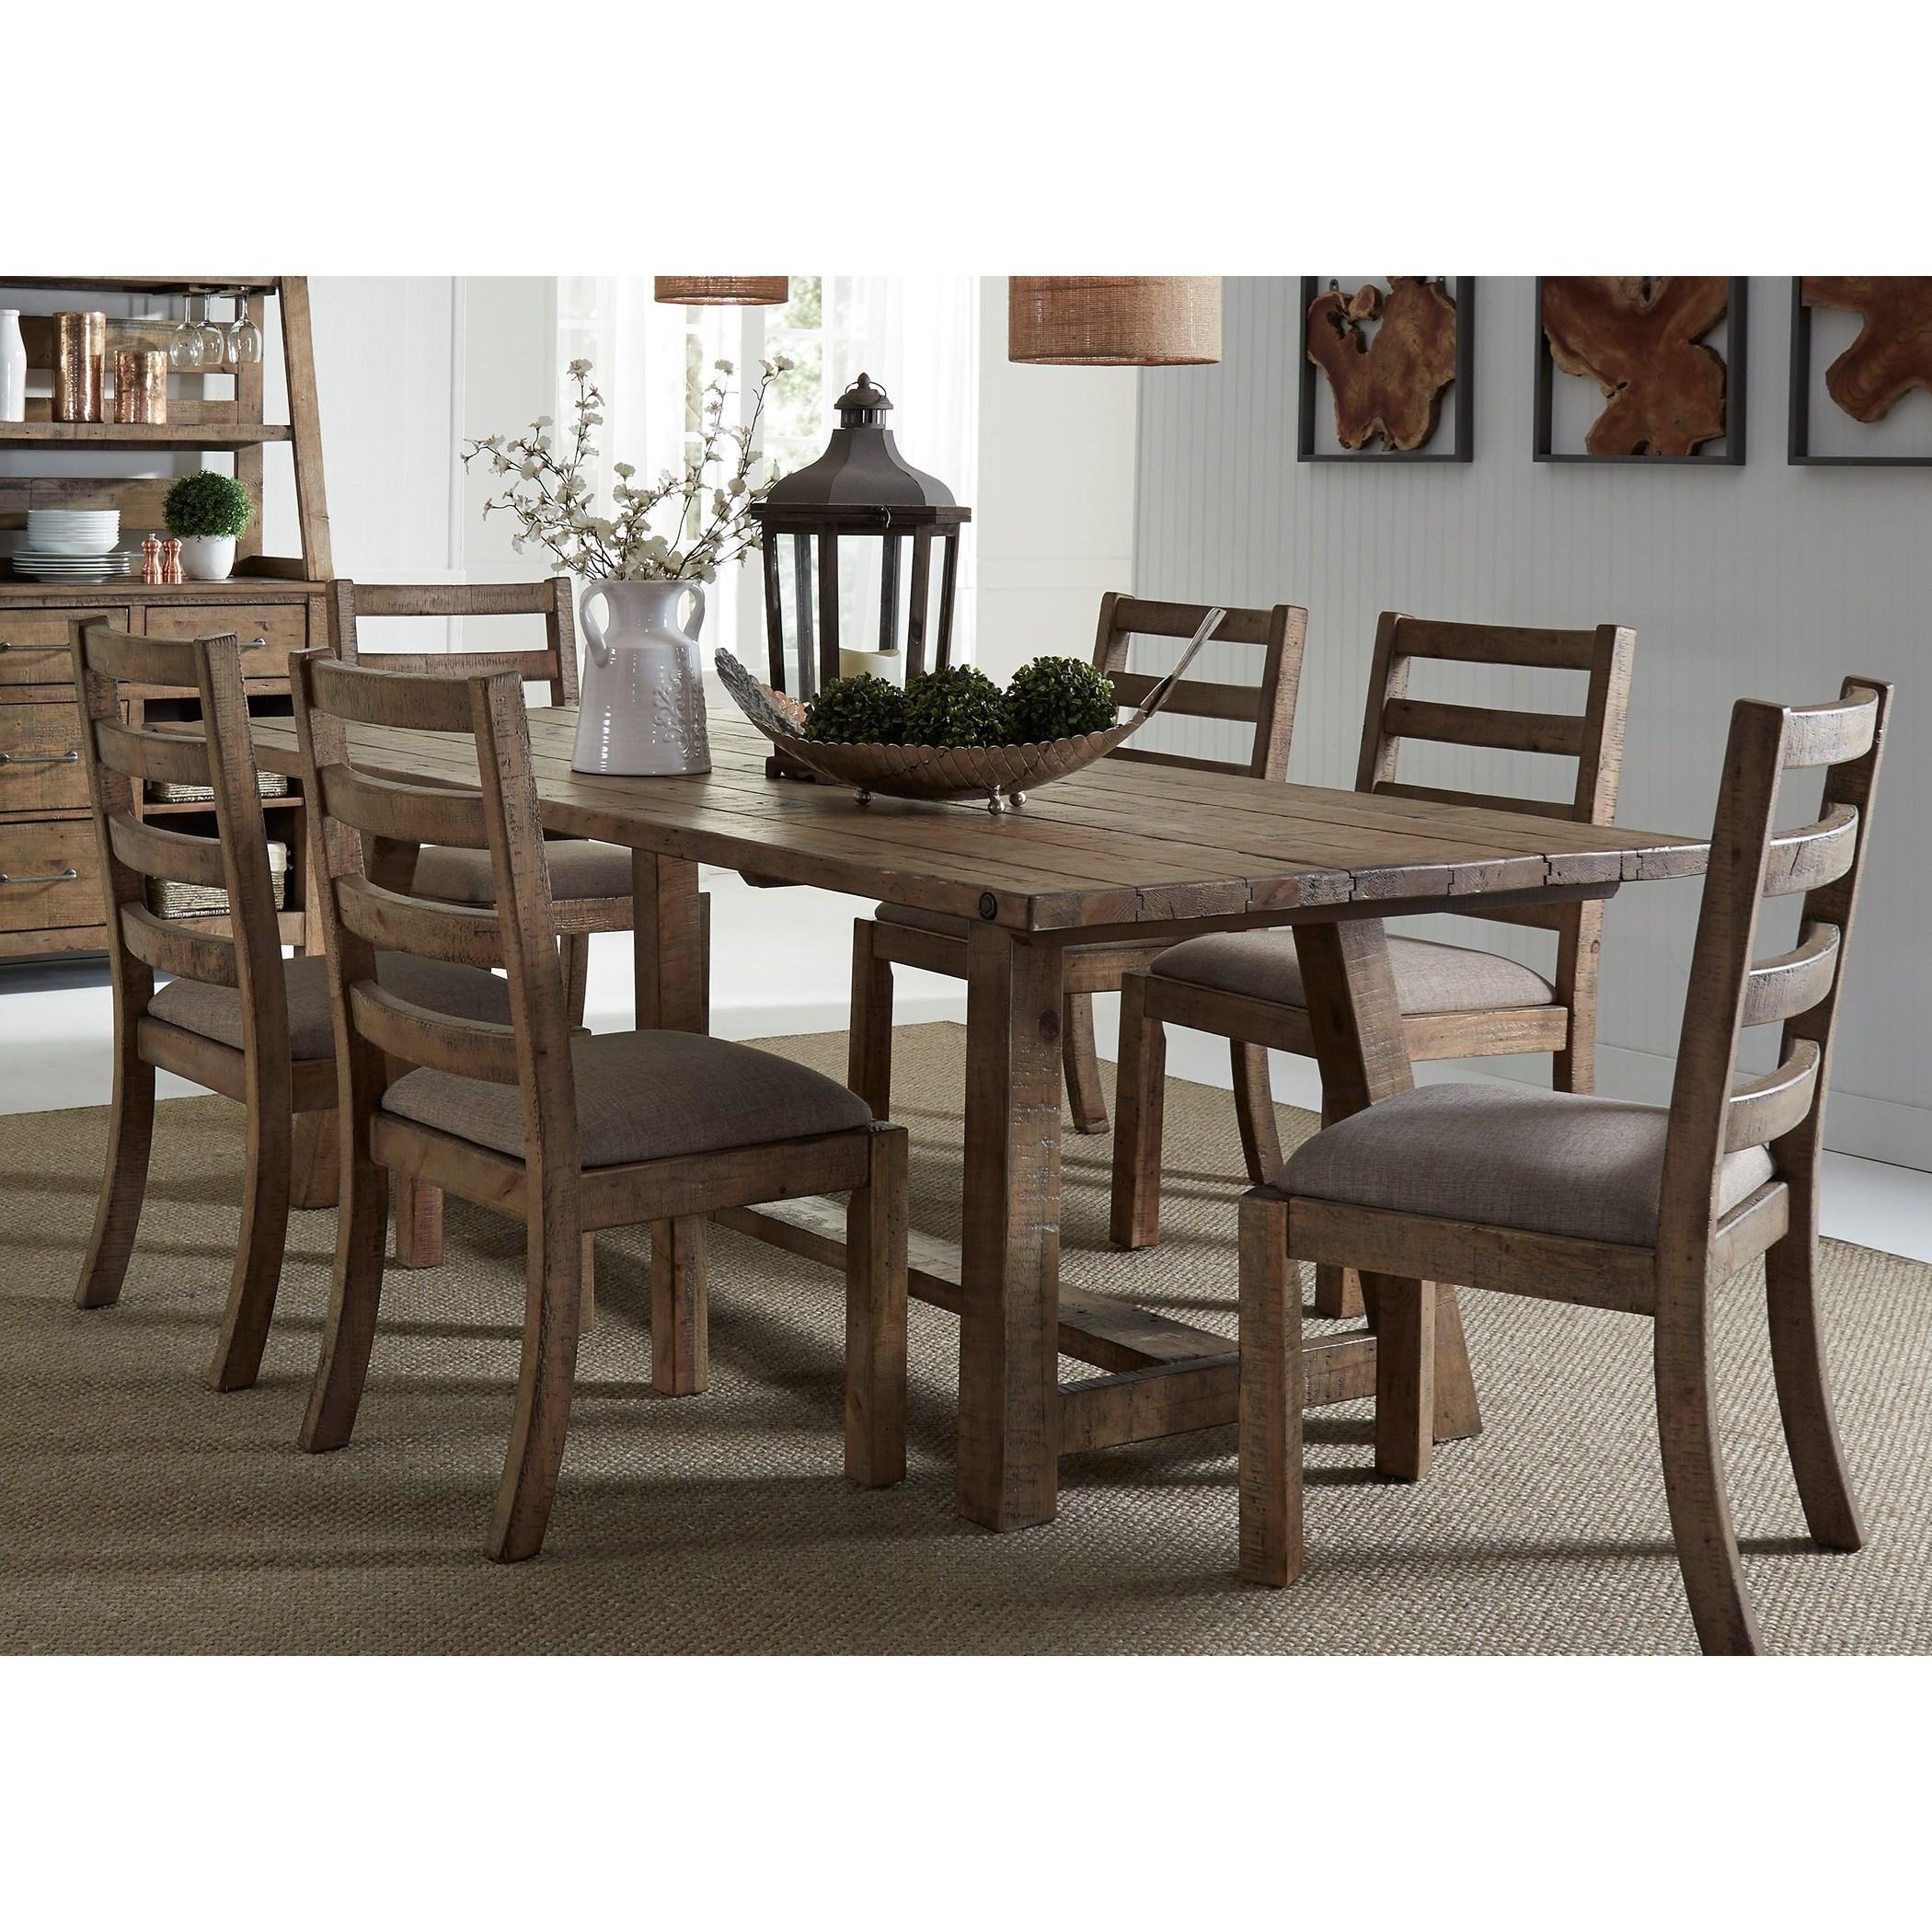 Liberty Furniture Prescott Valley 7 Piece 96 Trestle Table Set